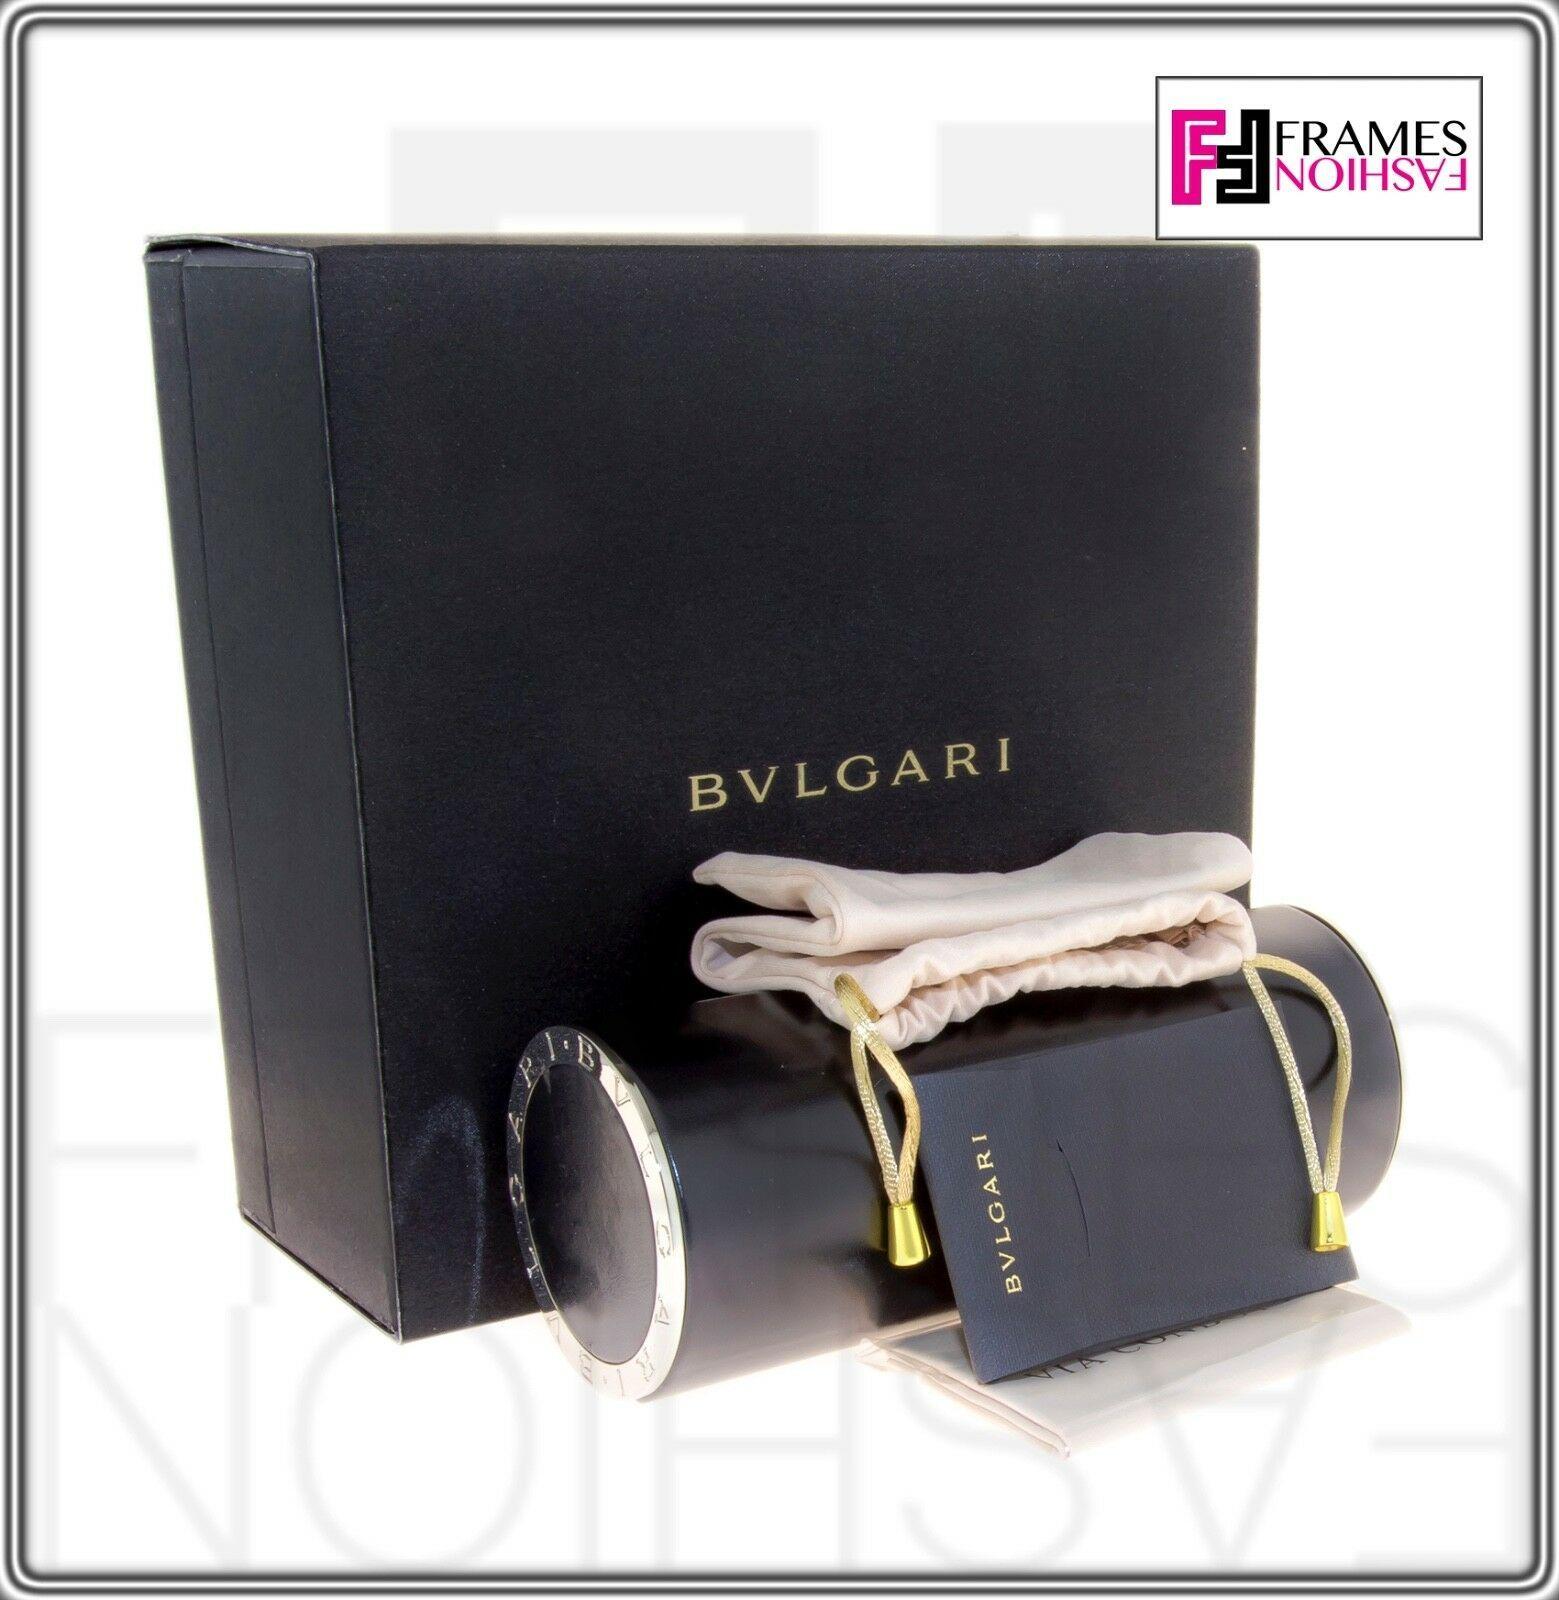 BVLGARI Le Gemme BV6078KB Black Gold 18K Plated POLARIZED Sunglasses 6078 Women image 8